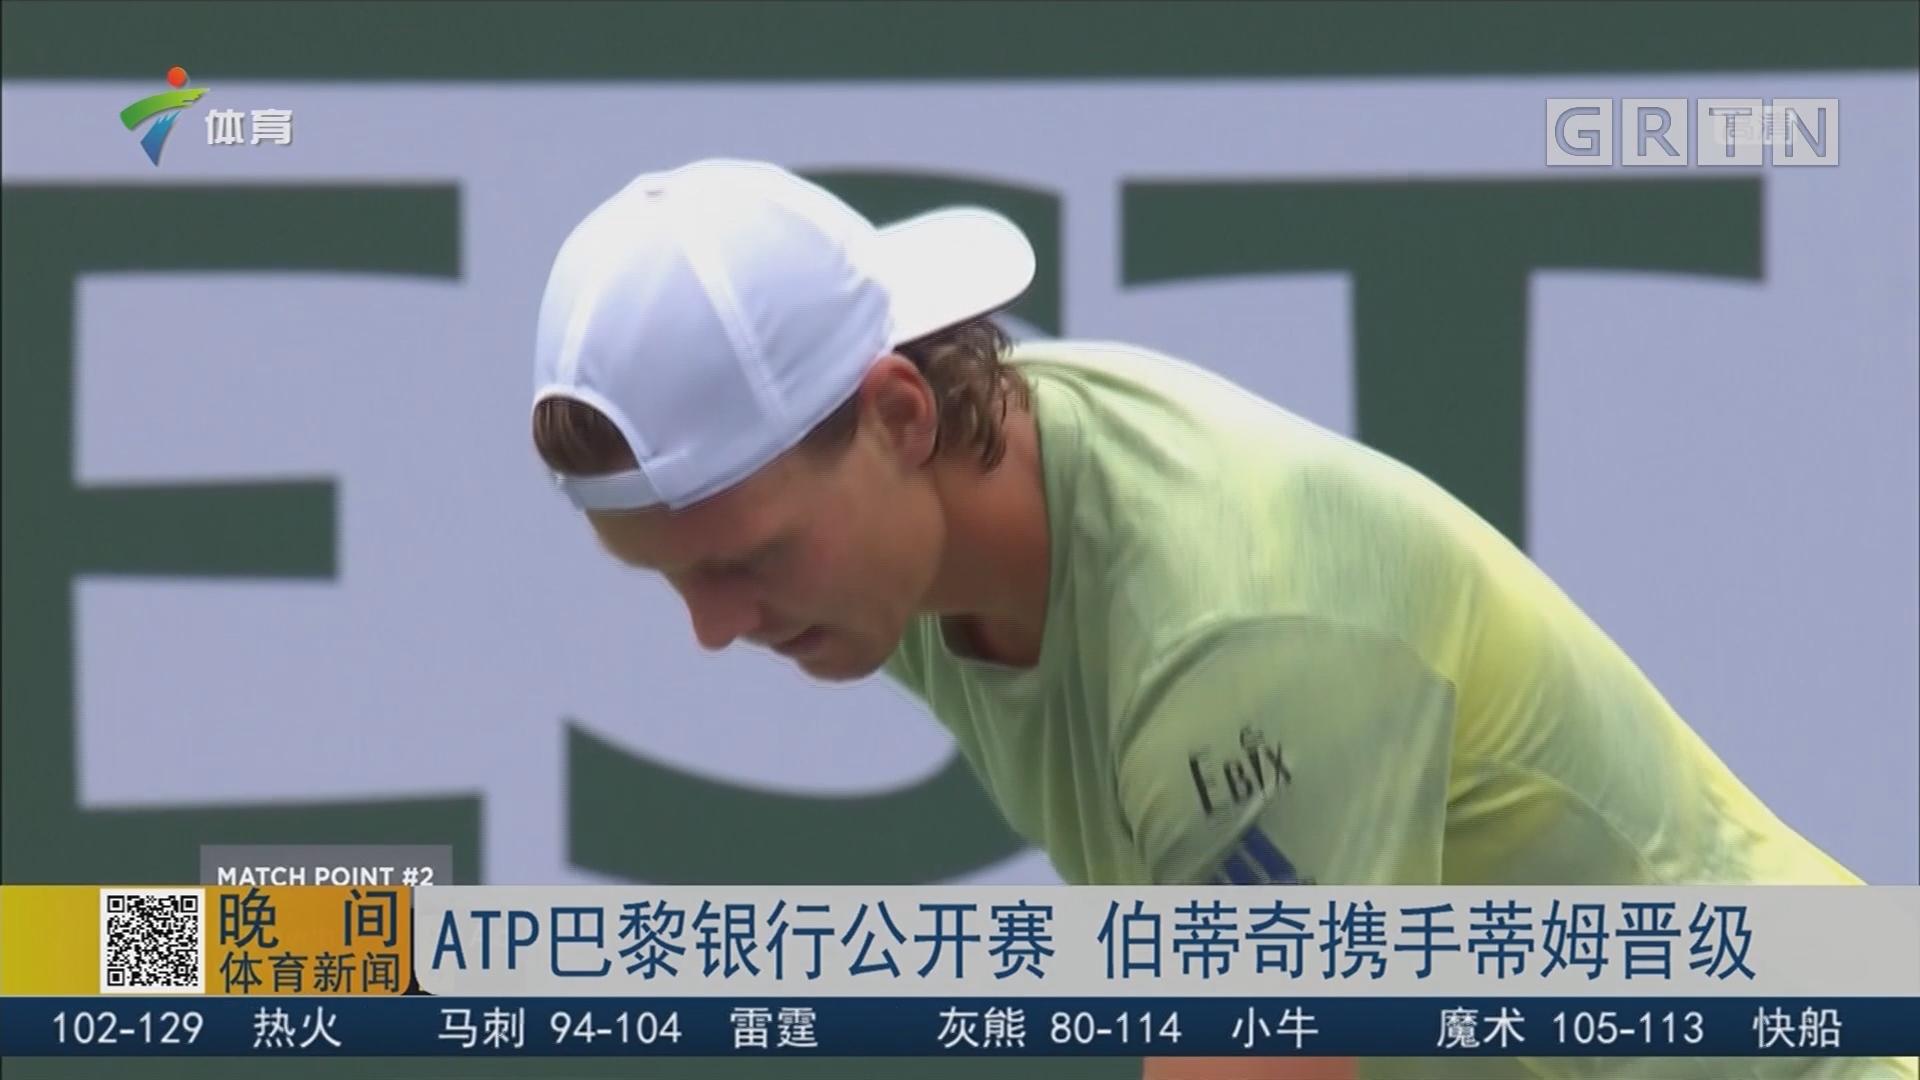 ATP巴黎银行公开赛 伯蒂奇携手蒂姆晋级